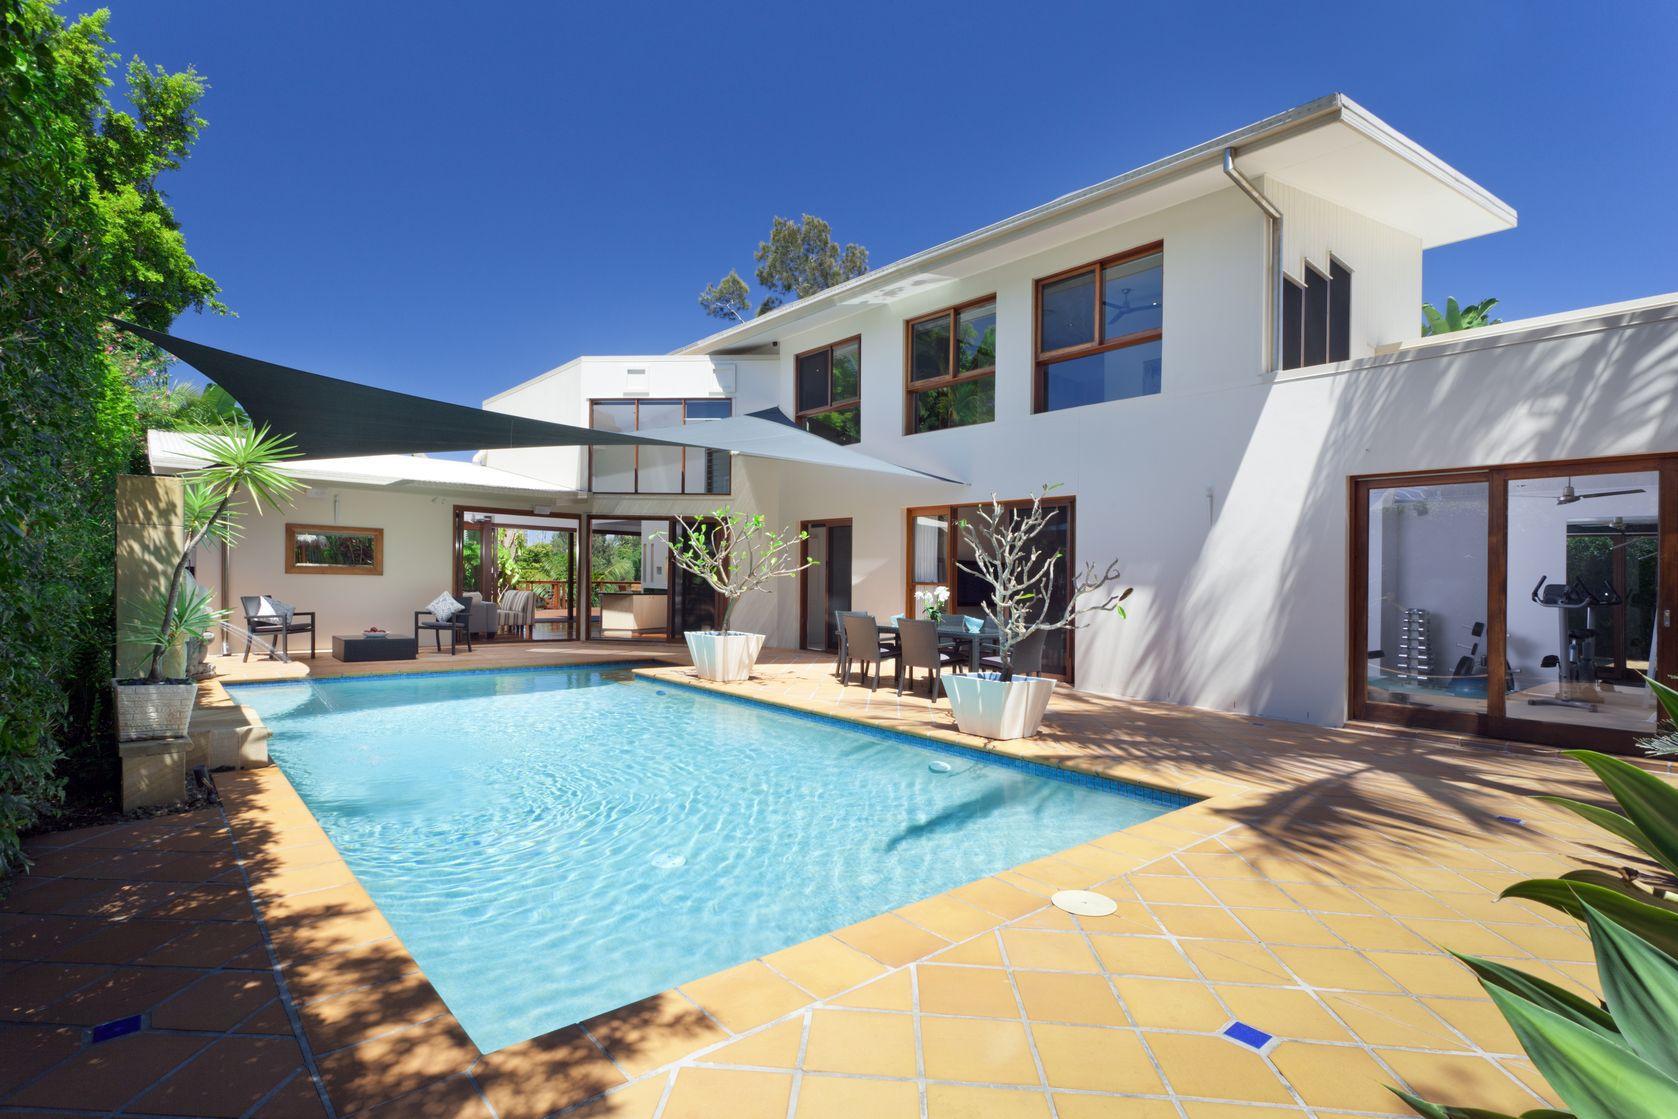 Los Angeles Luxury Real Estate Homes